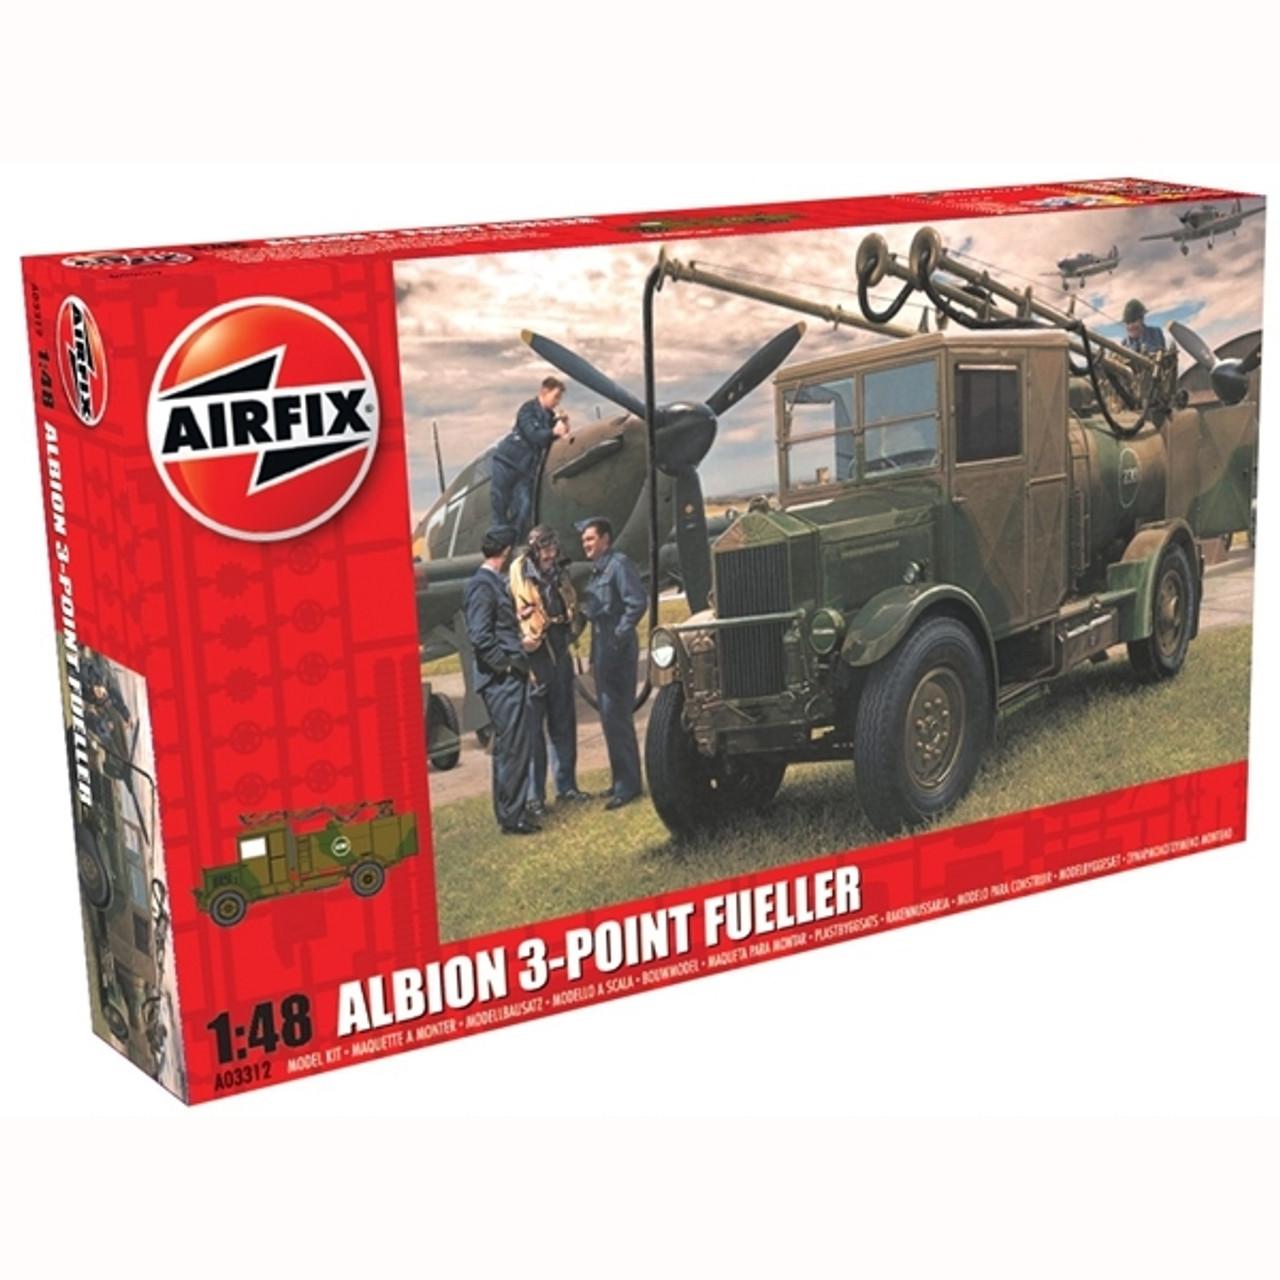 Airfix A03312 Albion AM463 3-Point Refueller 1:48 Scale Model Kit